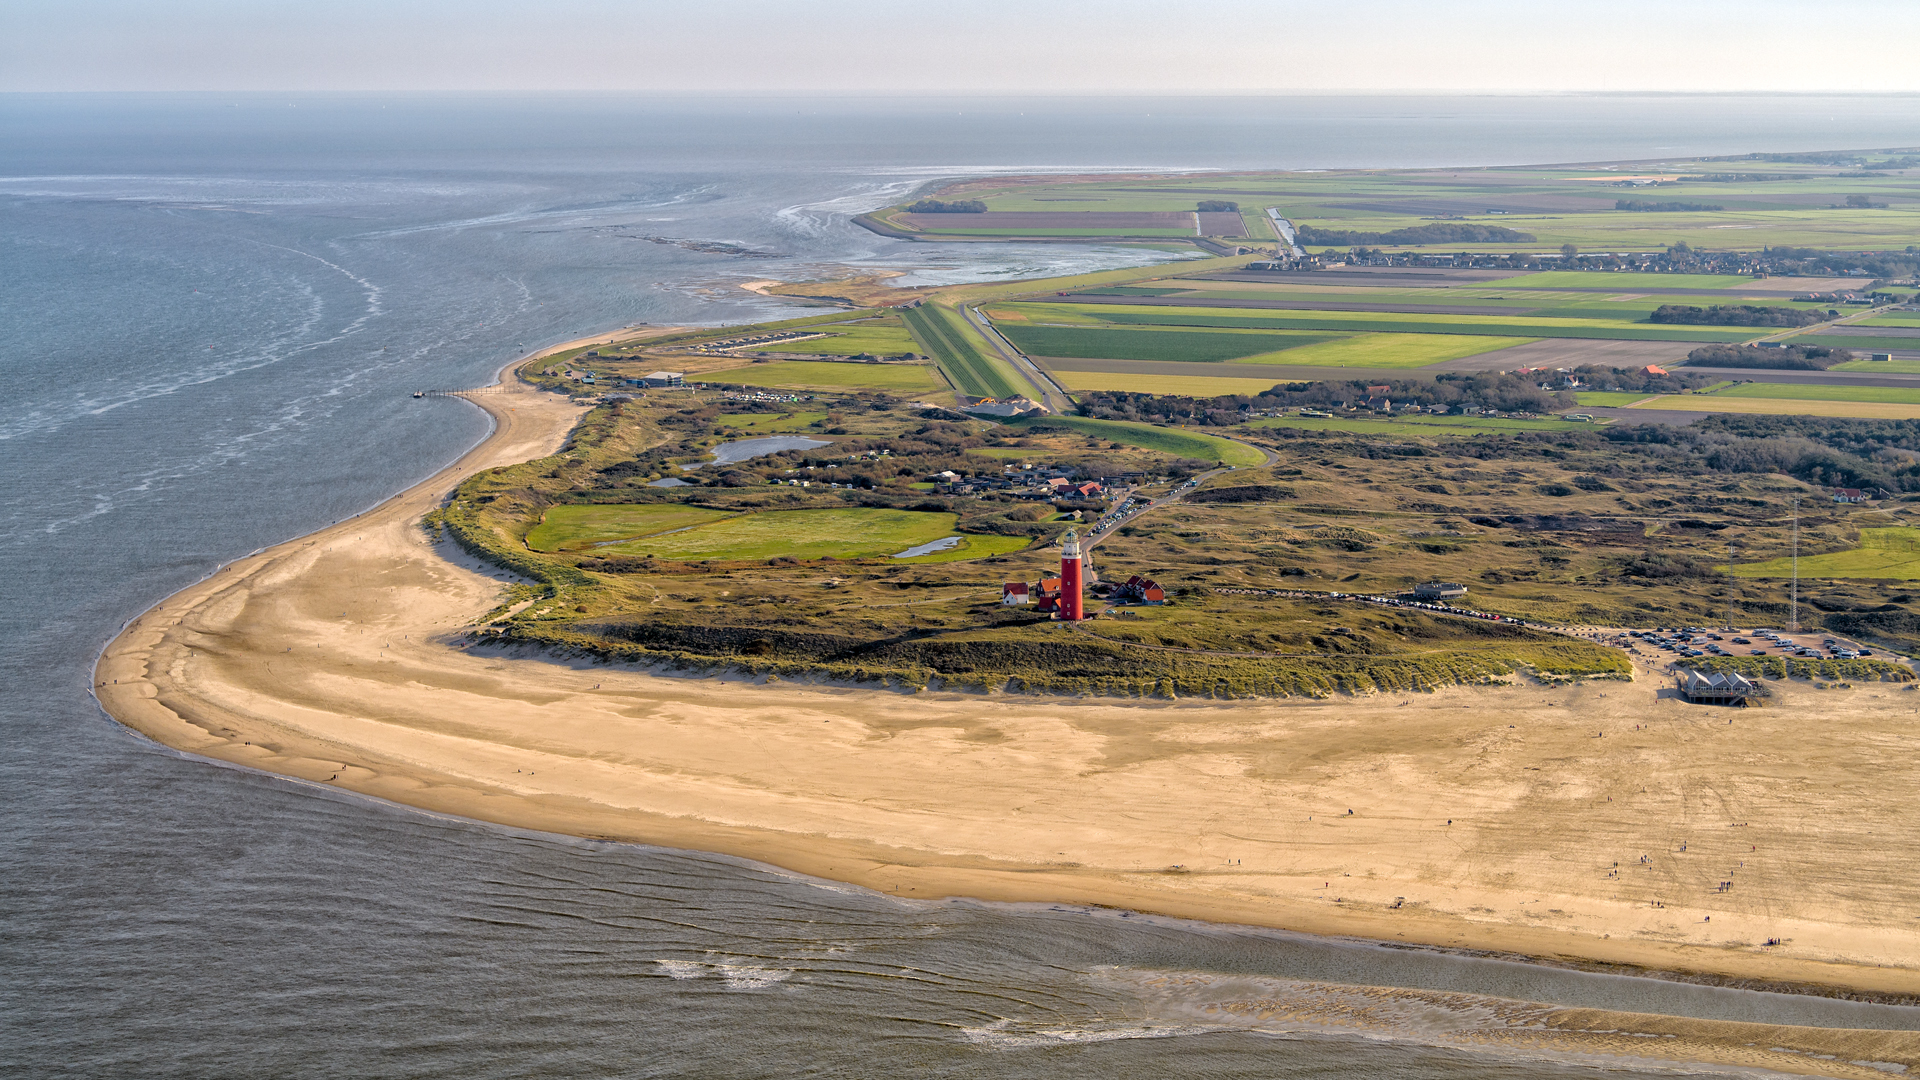 De Cocksdorp vanuit de lucht VVV Texel Roel Ovinge